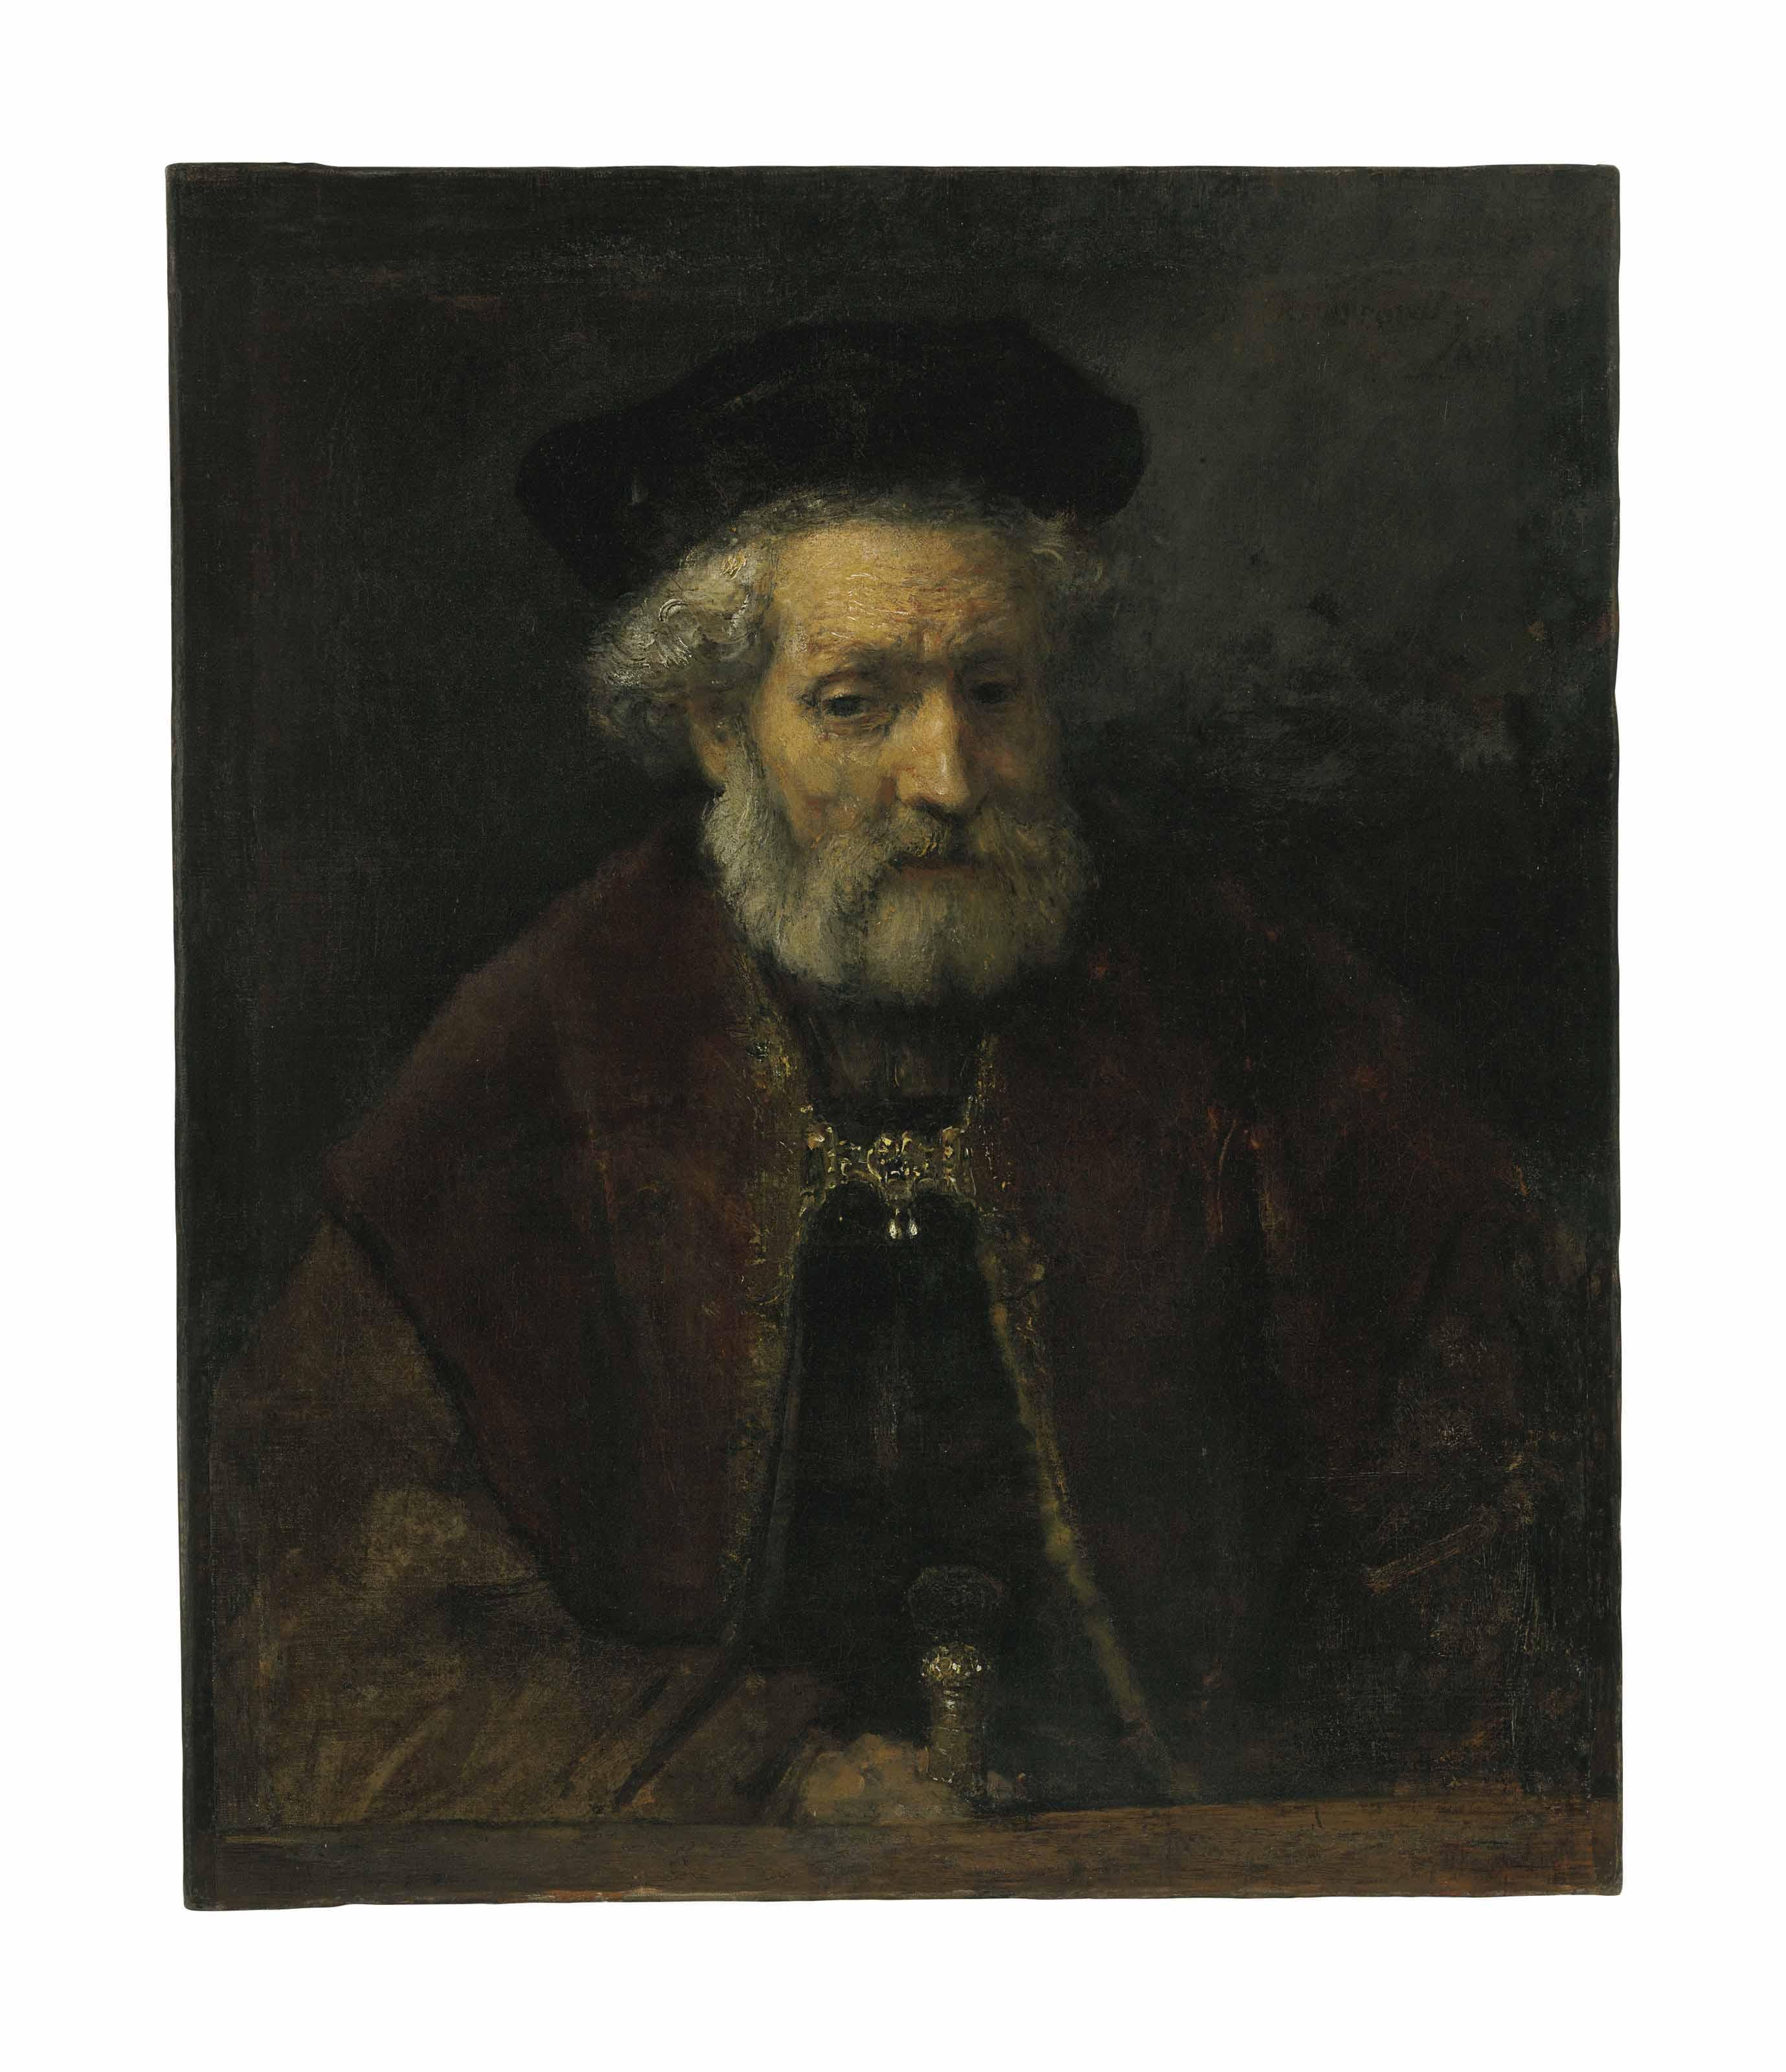 Attributed to Rembrandt Harmensz. van Rijn (Leiden 1606-1669 Amsterdam)